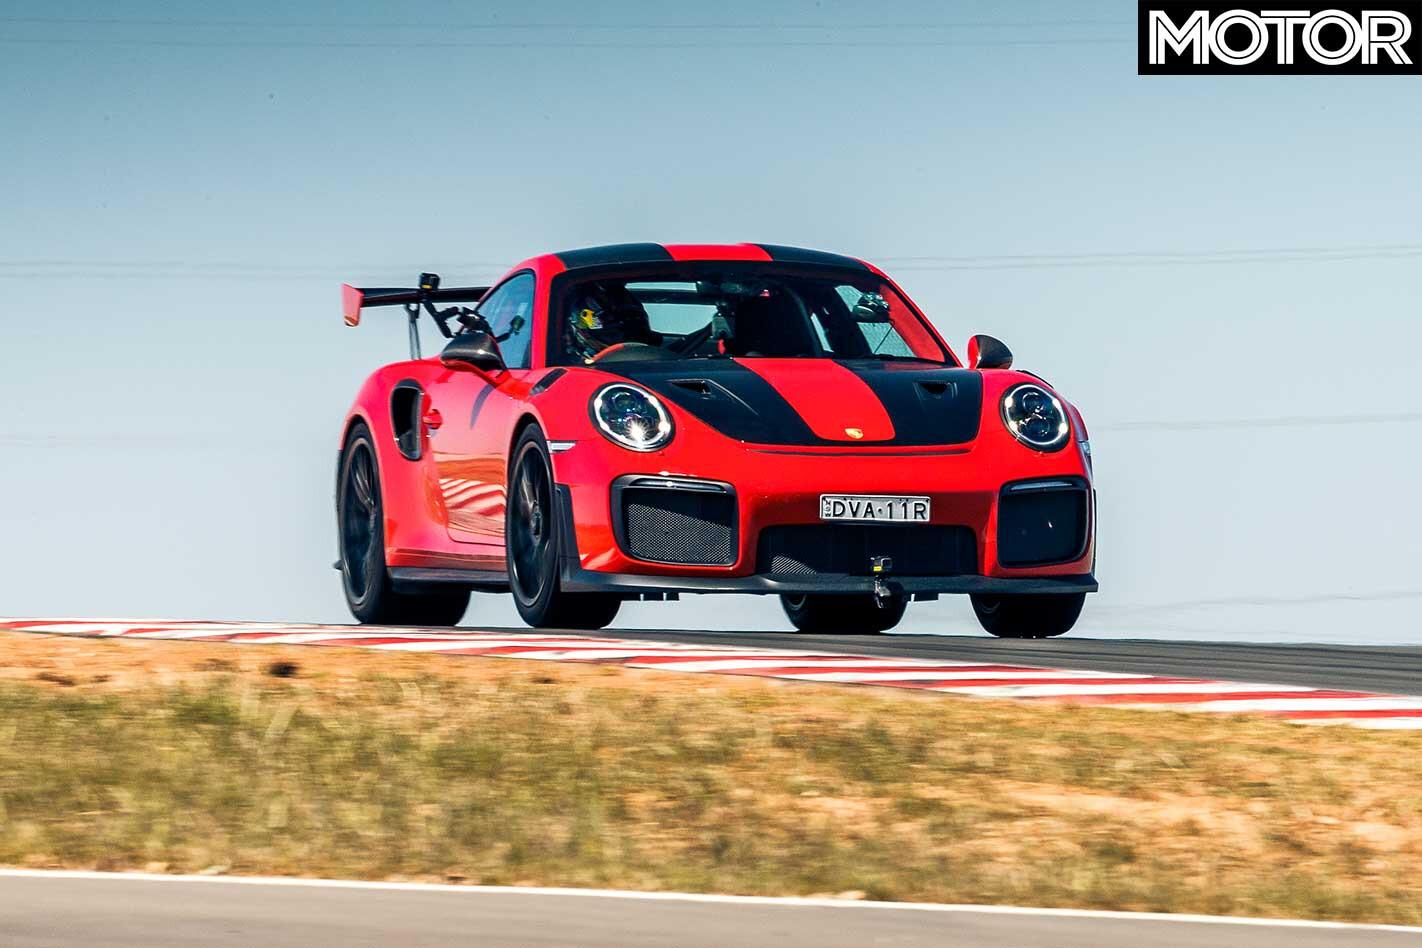 Performance Car Of The Year 2019 Porsche 911 GT 2 RS Jpg